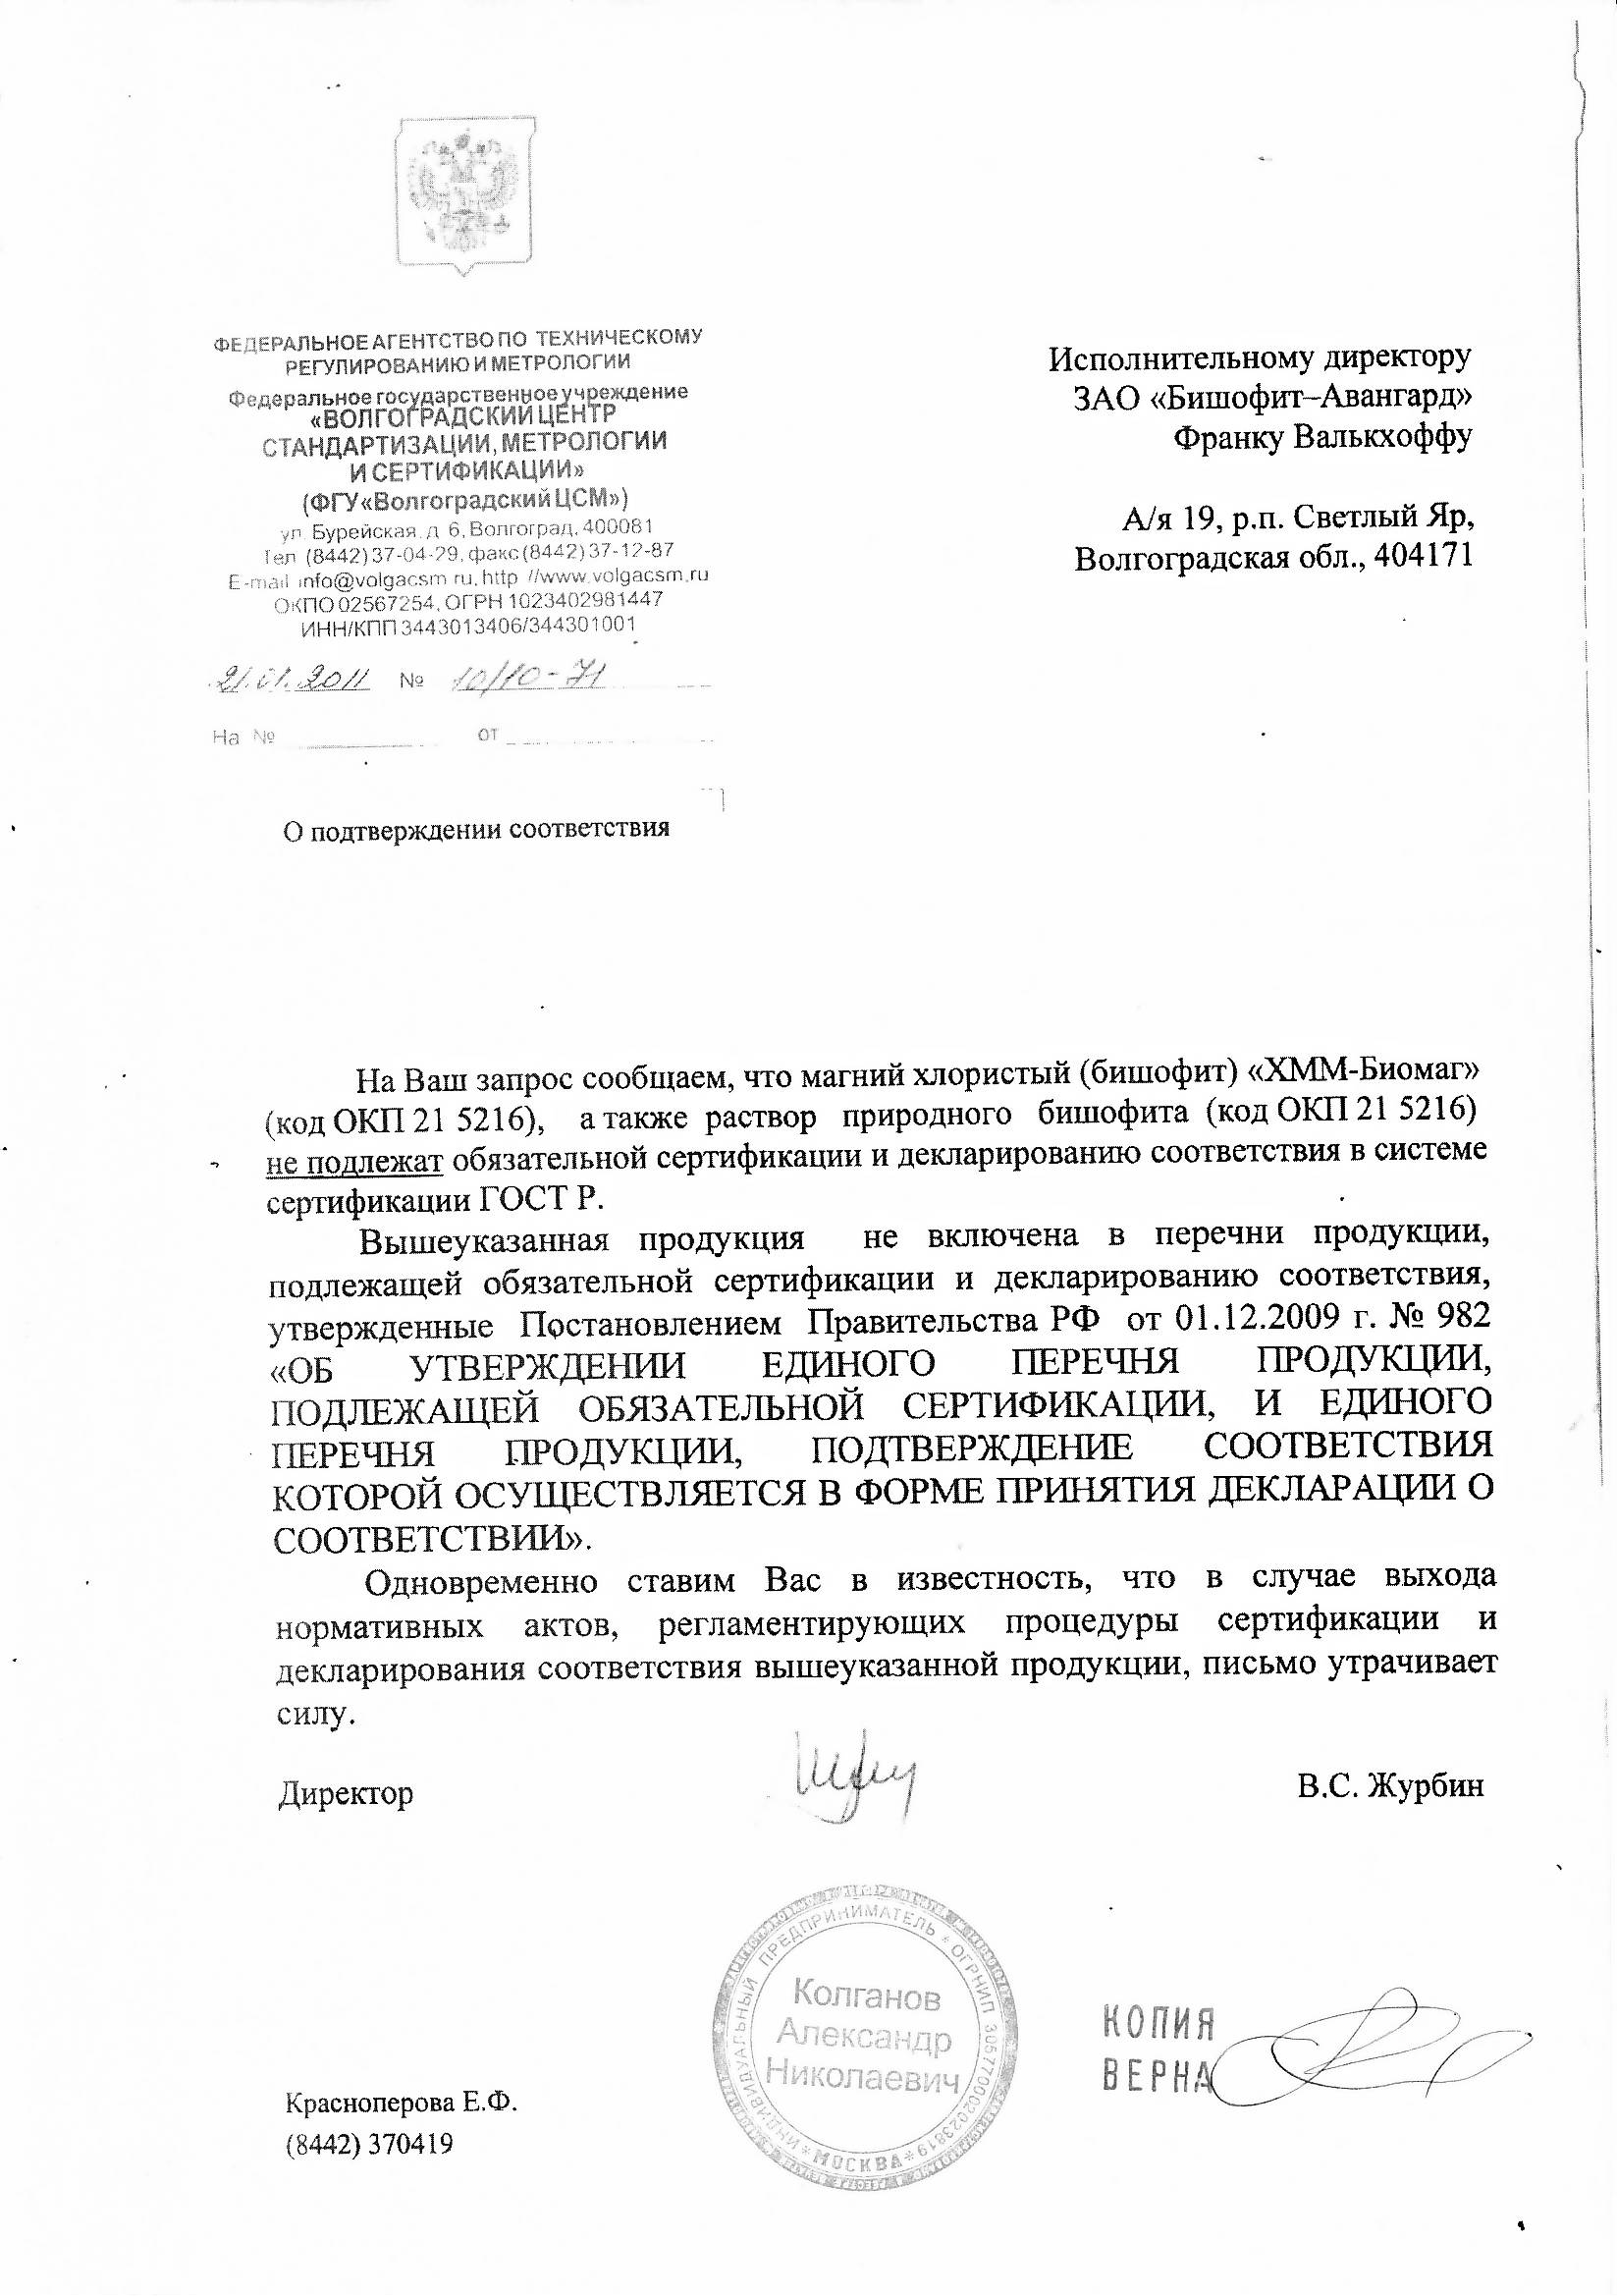 О сертификации противогололедного реагента ХММ-БиоМаг (бишофит, магний хлористый), код ОКП 21 5216. ✱